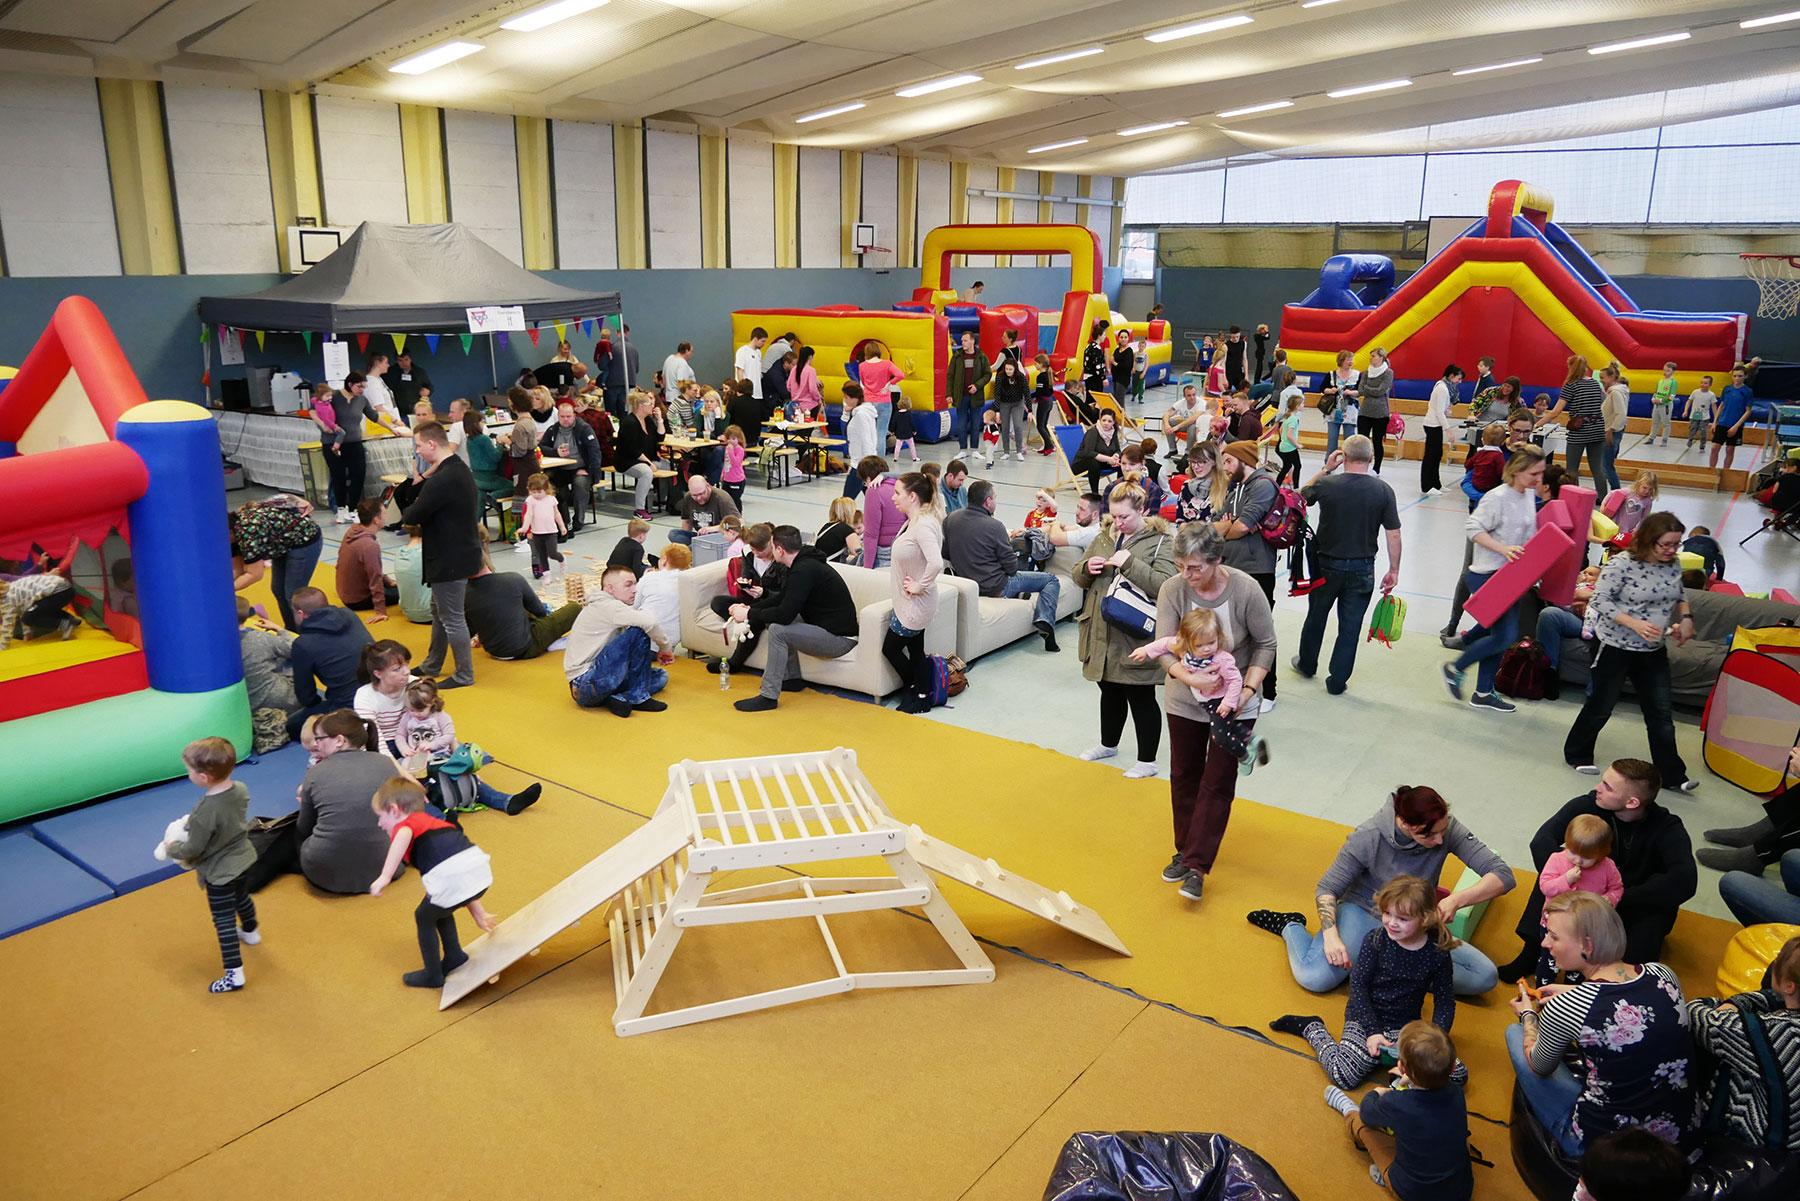 750 Besucher beim ersten Bad Belziger Familien-Indoorspielplatz